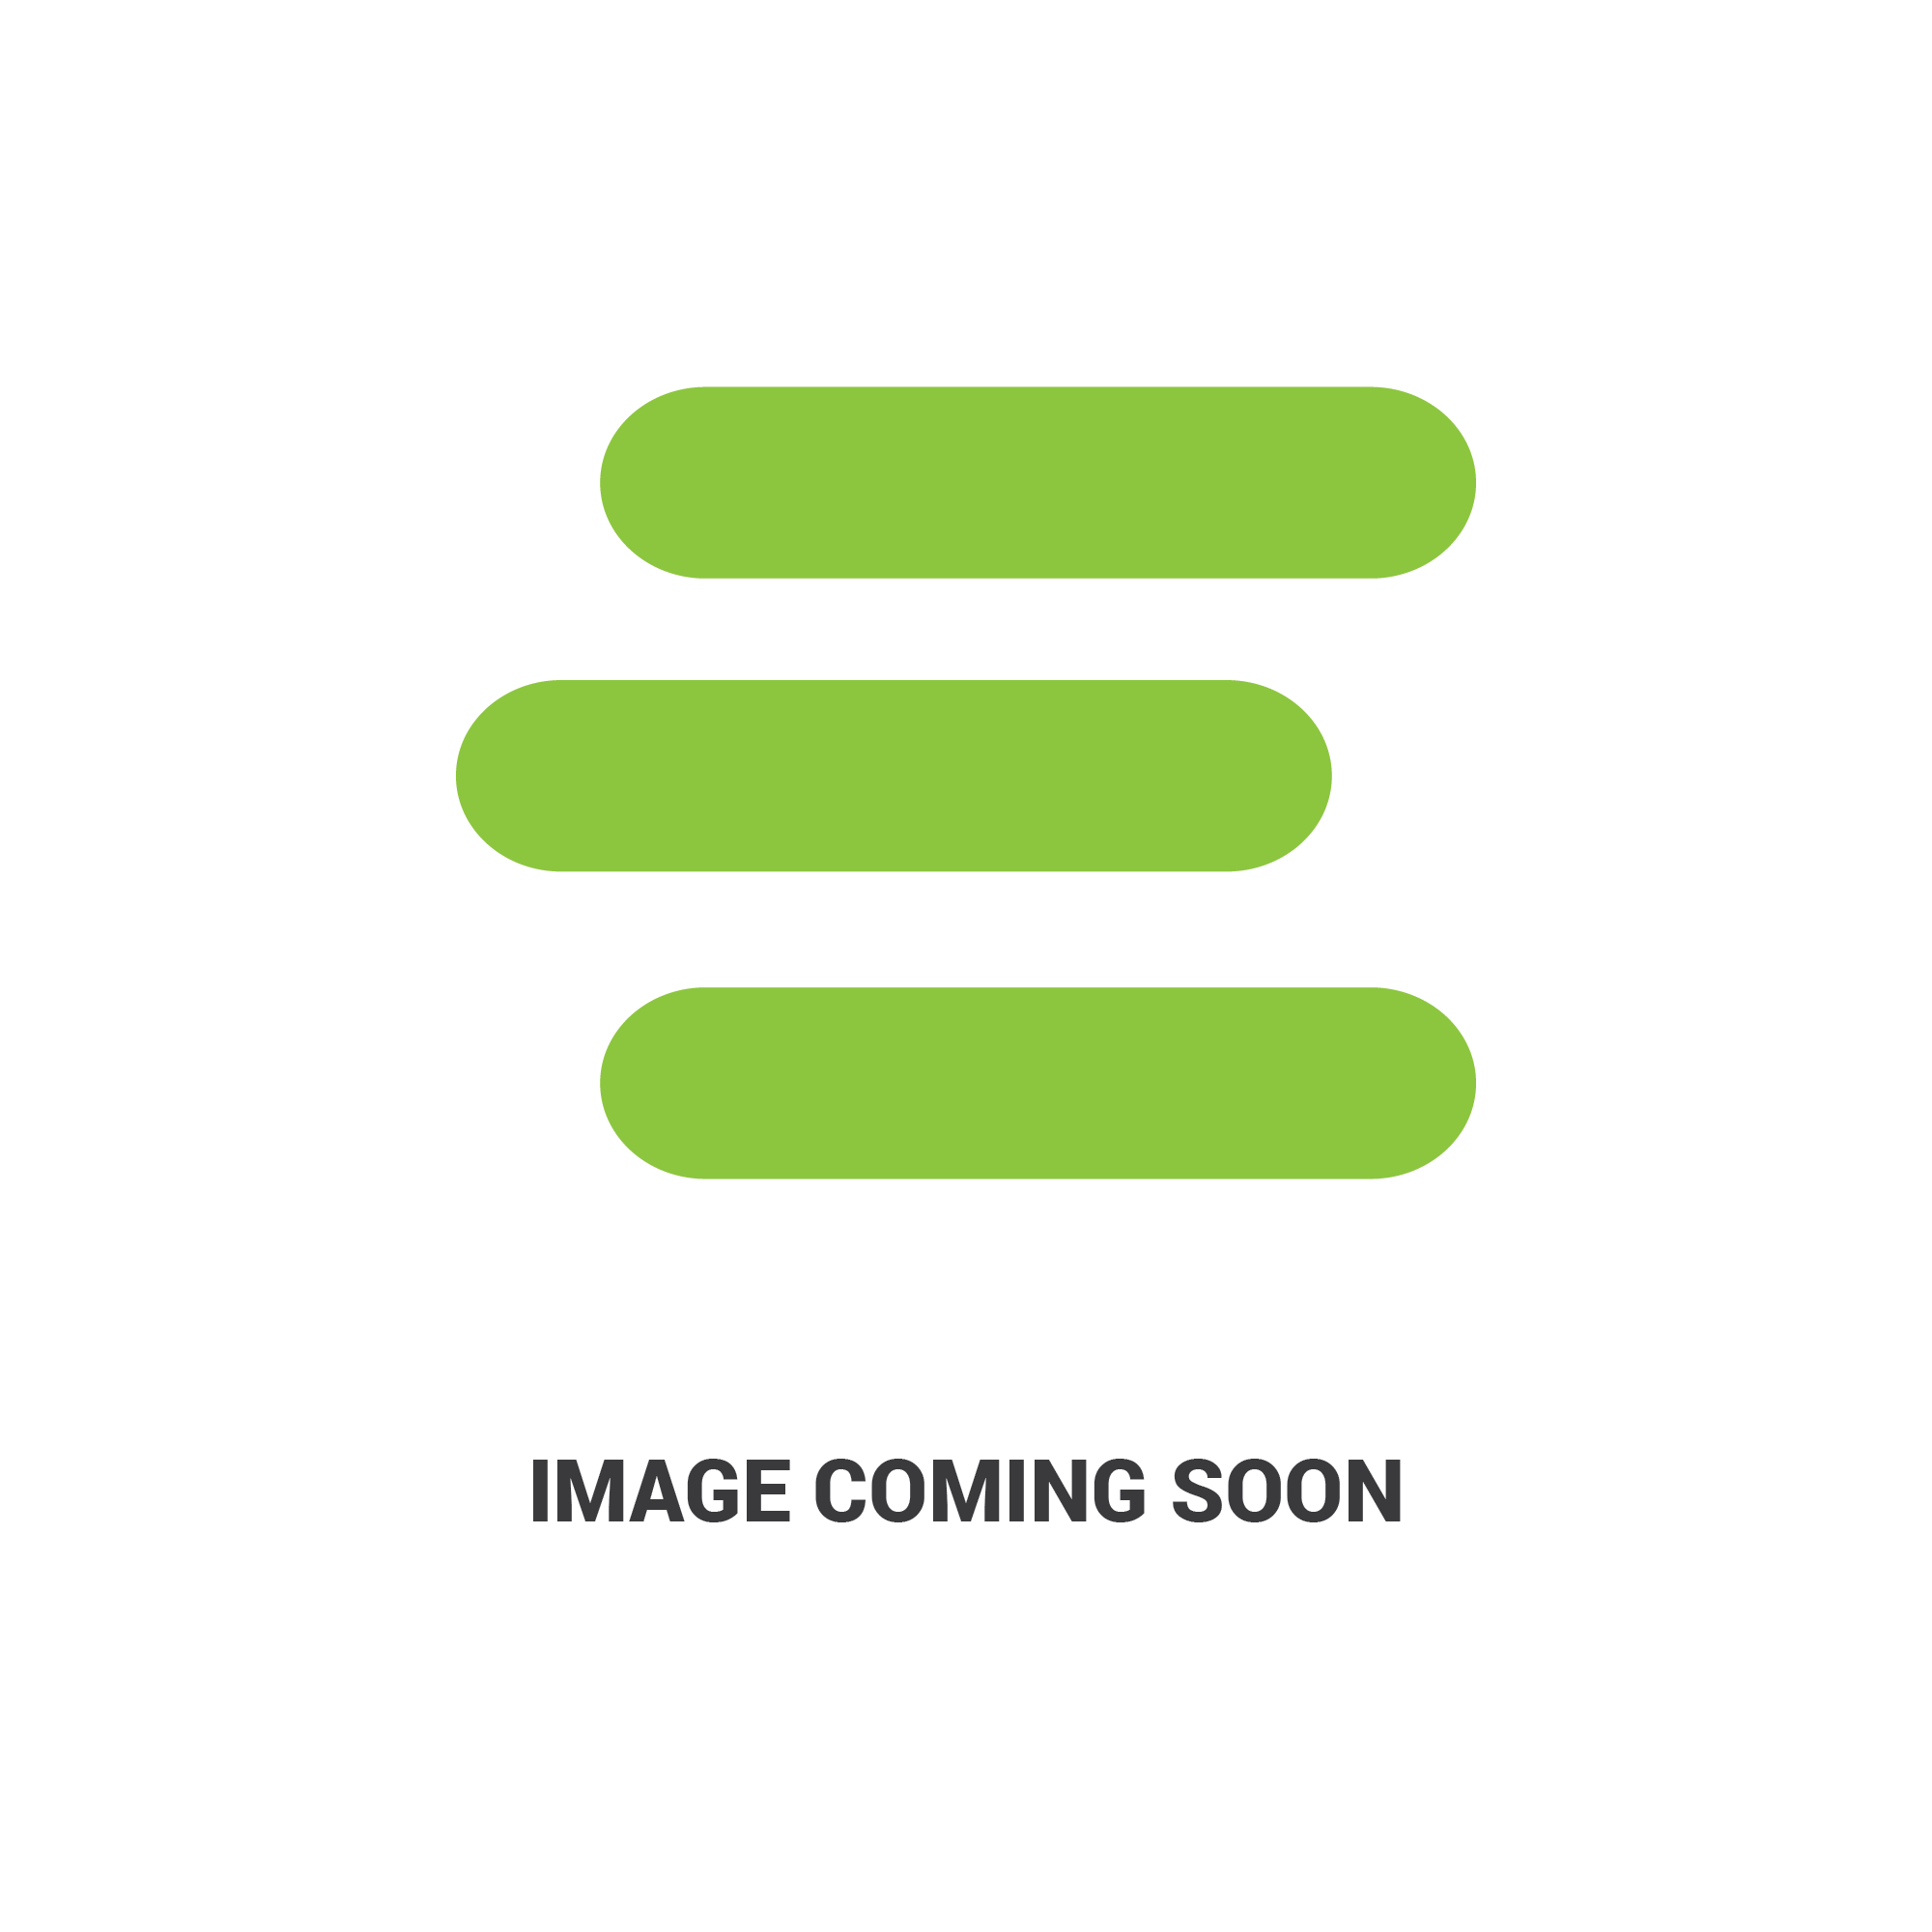 E-15221-12432edit 1.jpg